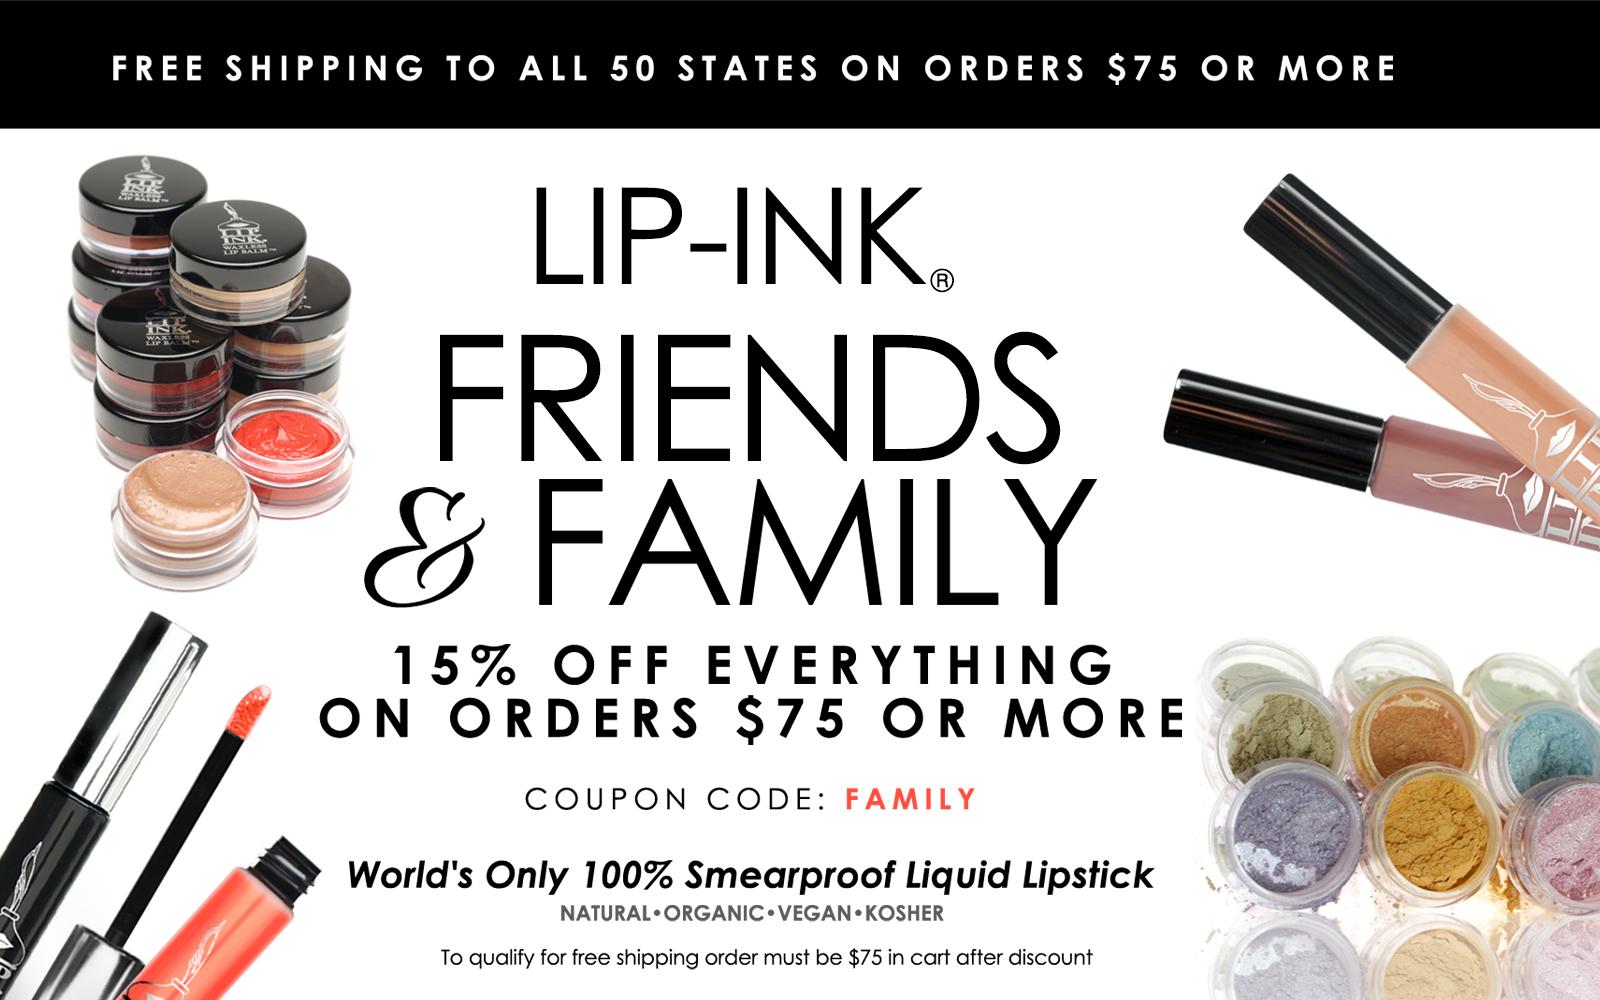 LIP INK Lipstick Kit